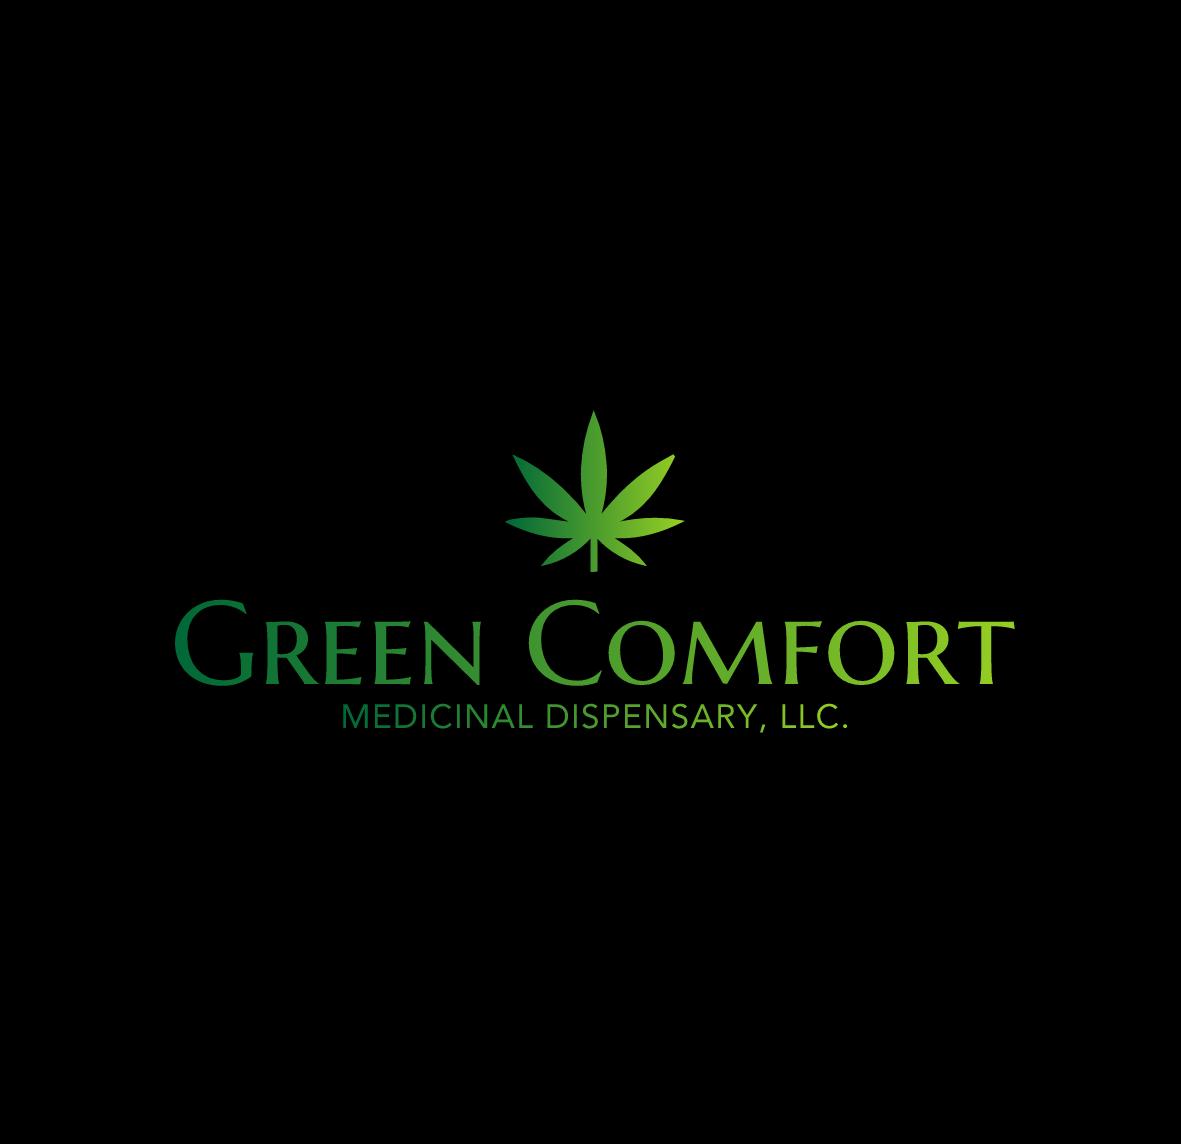 Green Comfort Medicinal Dispensary, LLC.